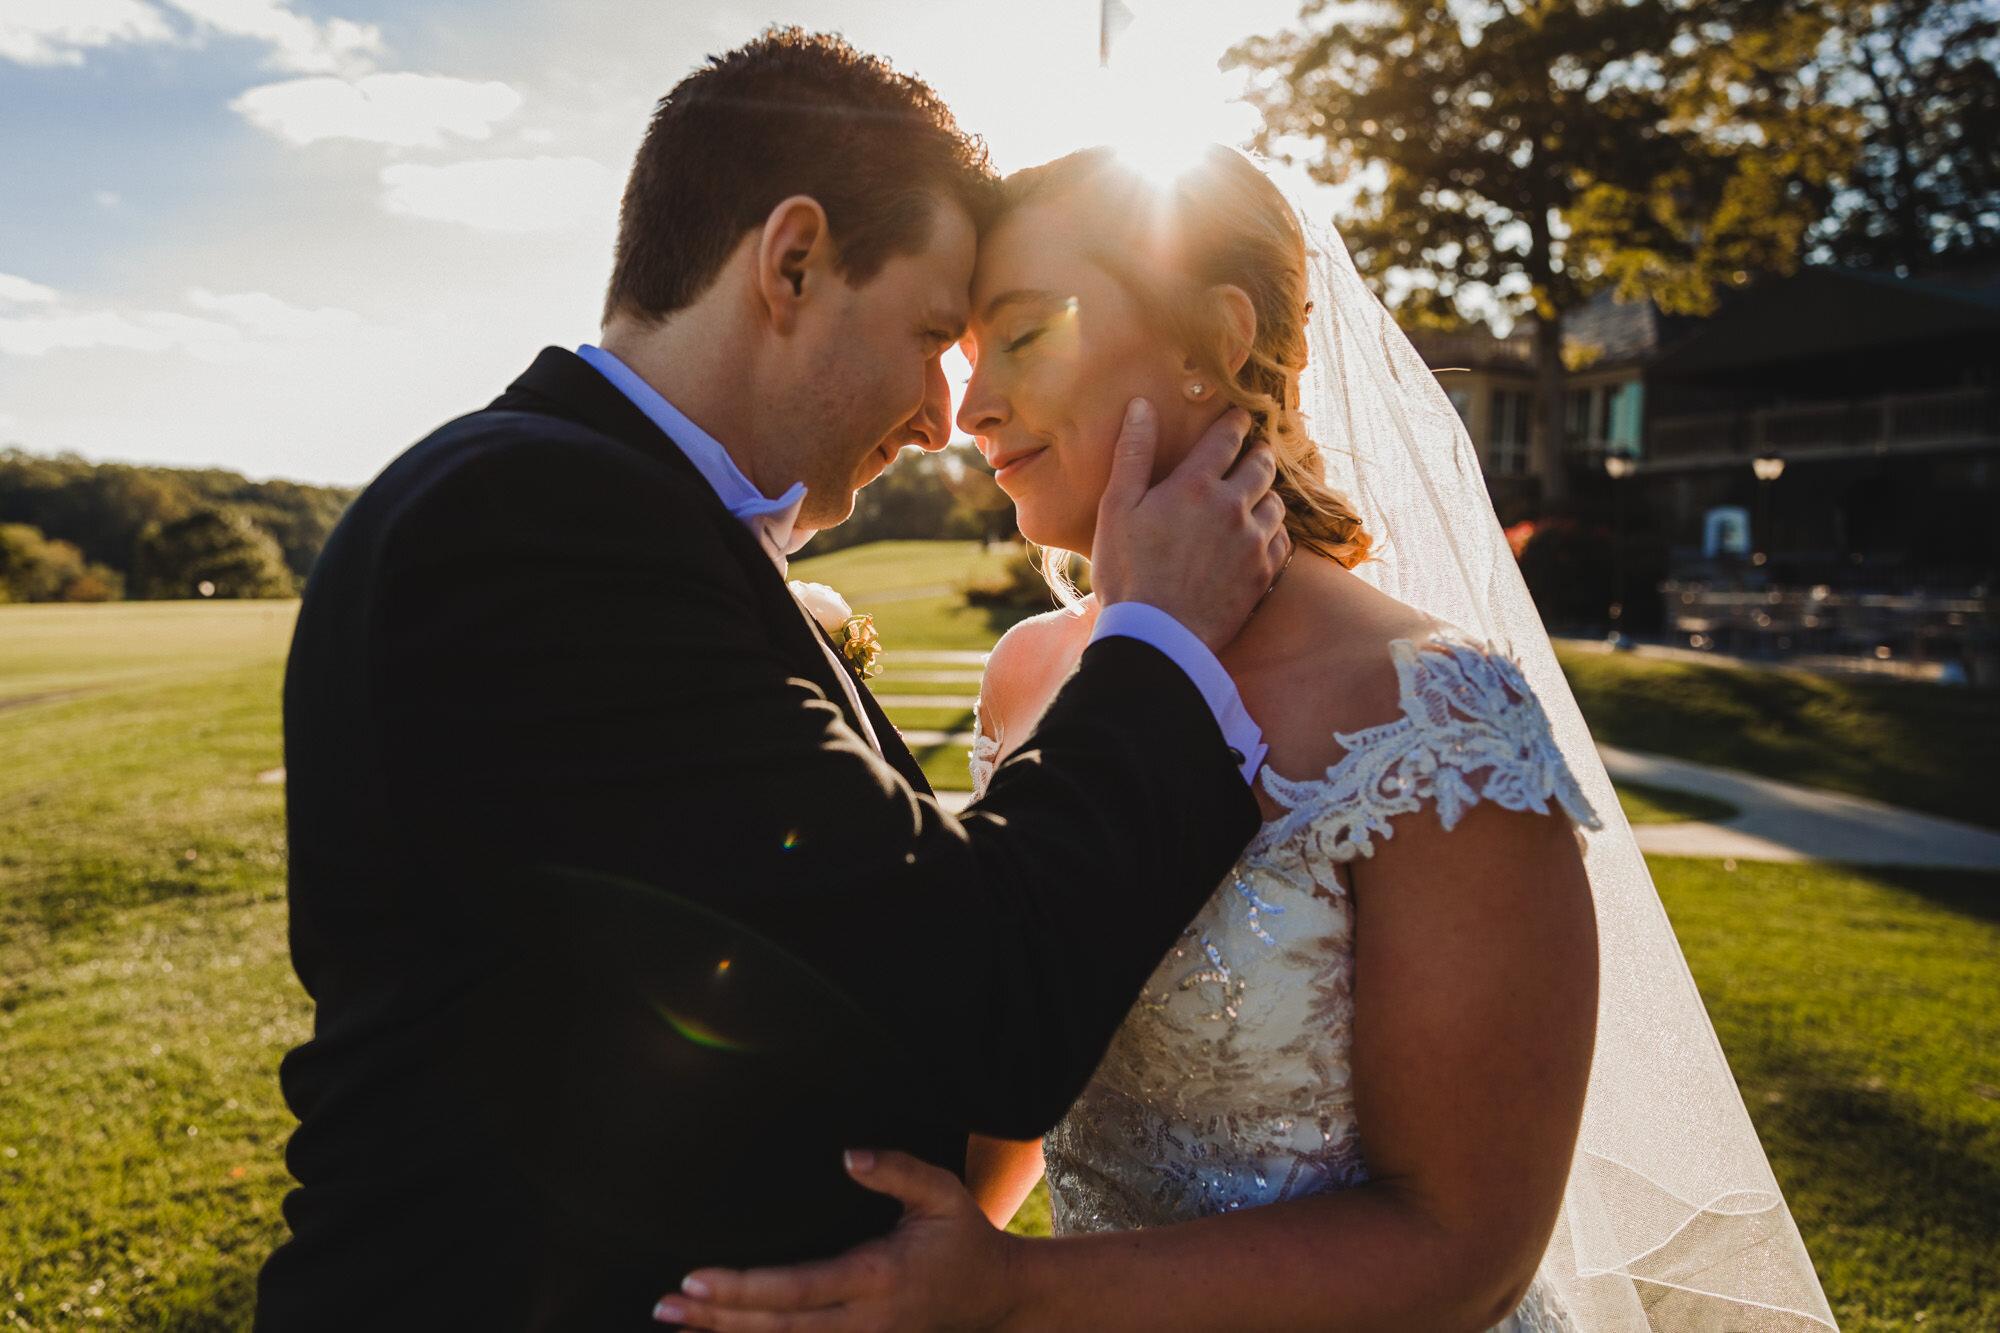 Christina & Dan Wedding at Huntingdon Valley Country Club 00016.JPG